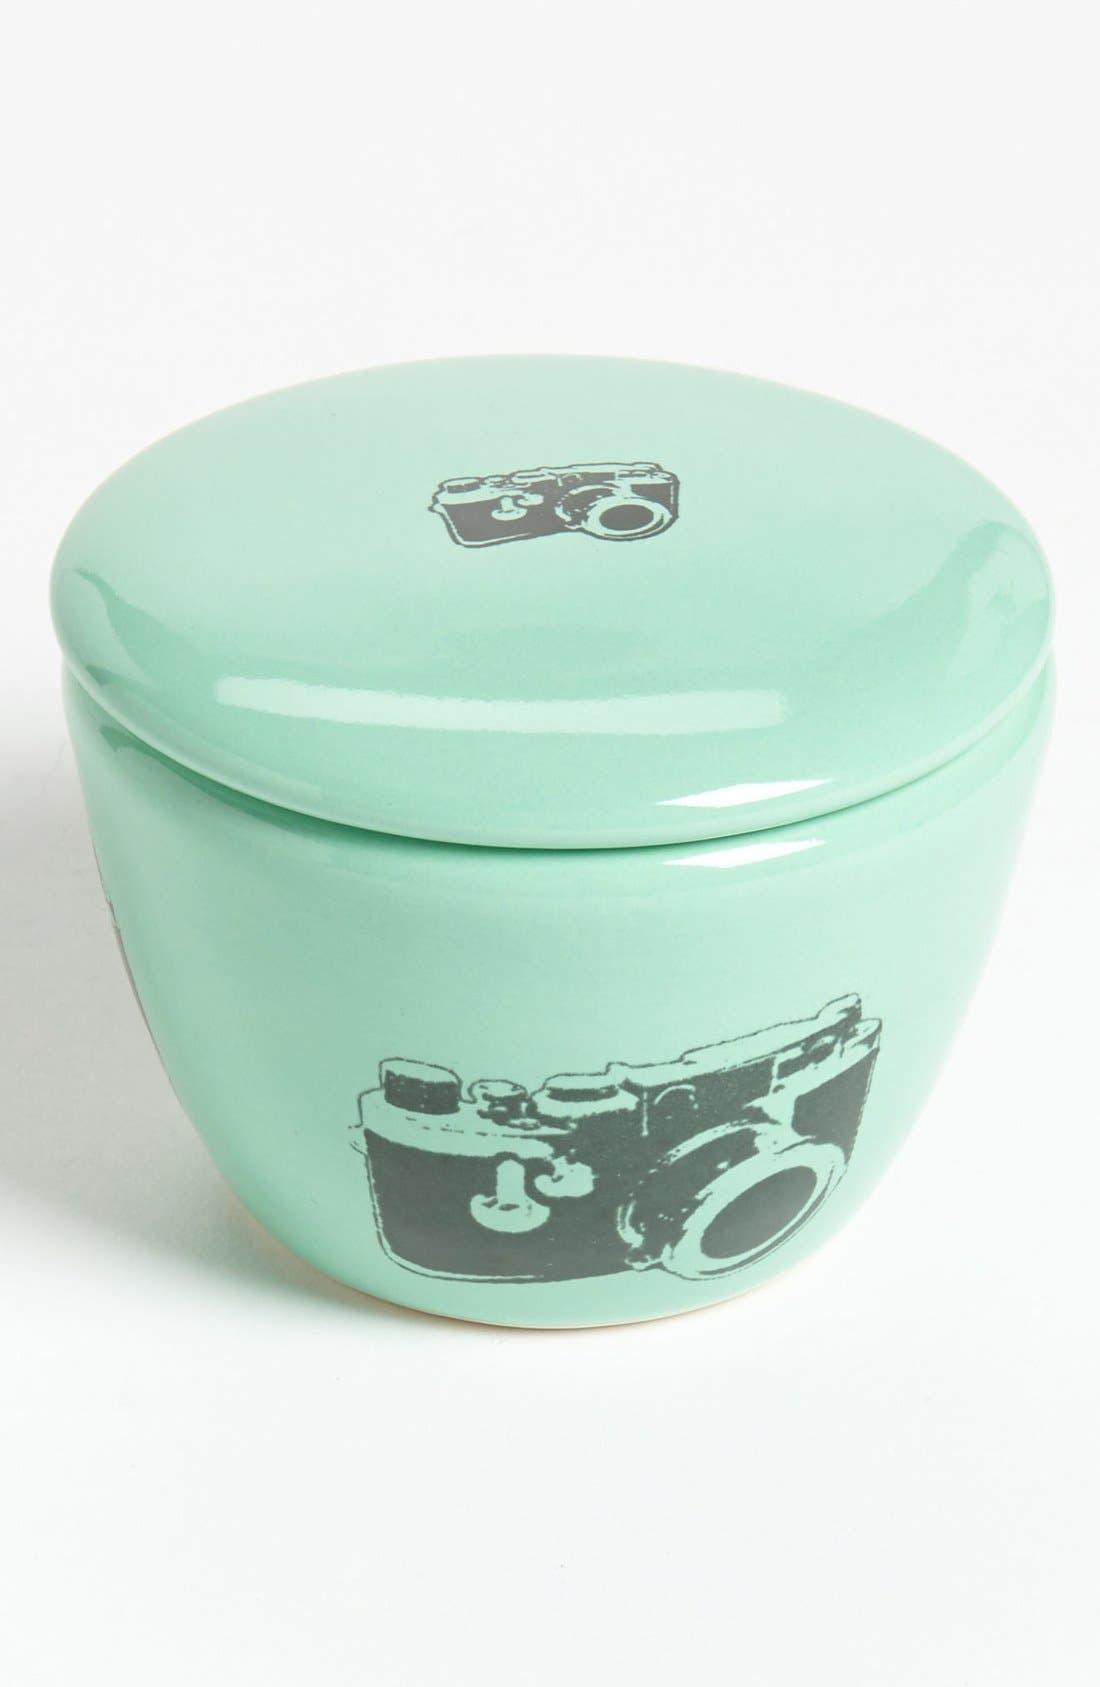 Alternate Image 1 Selected - CircaCeramics 'Camera' Lidded Bowl